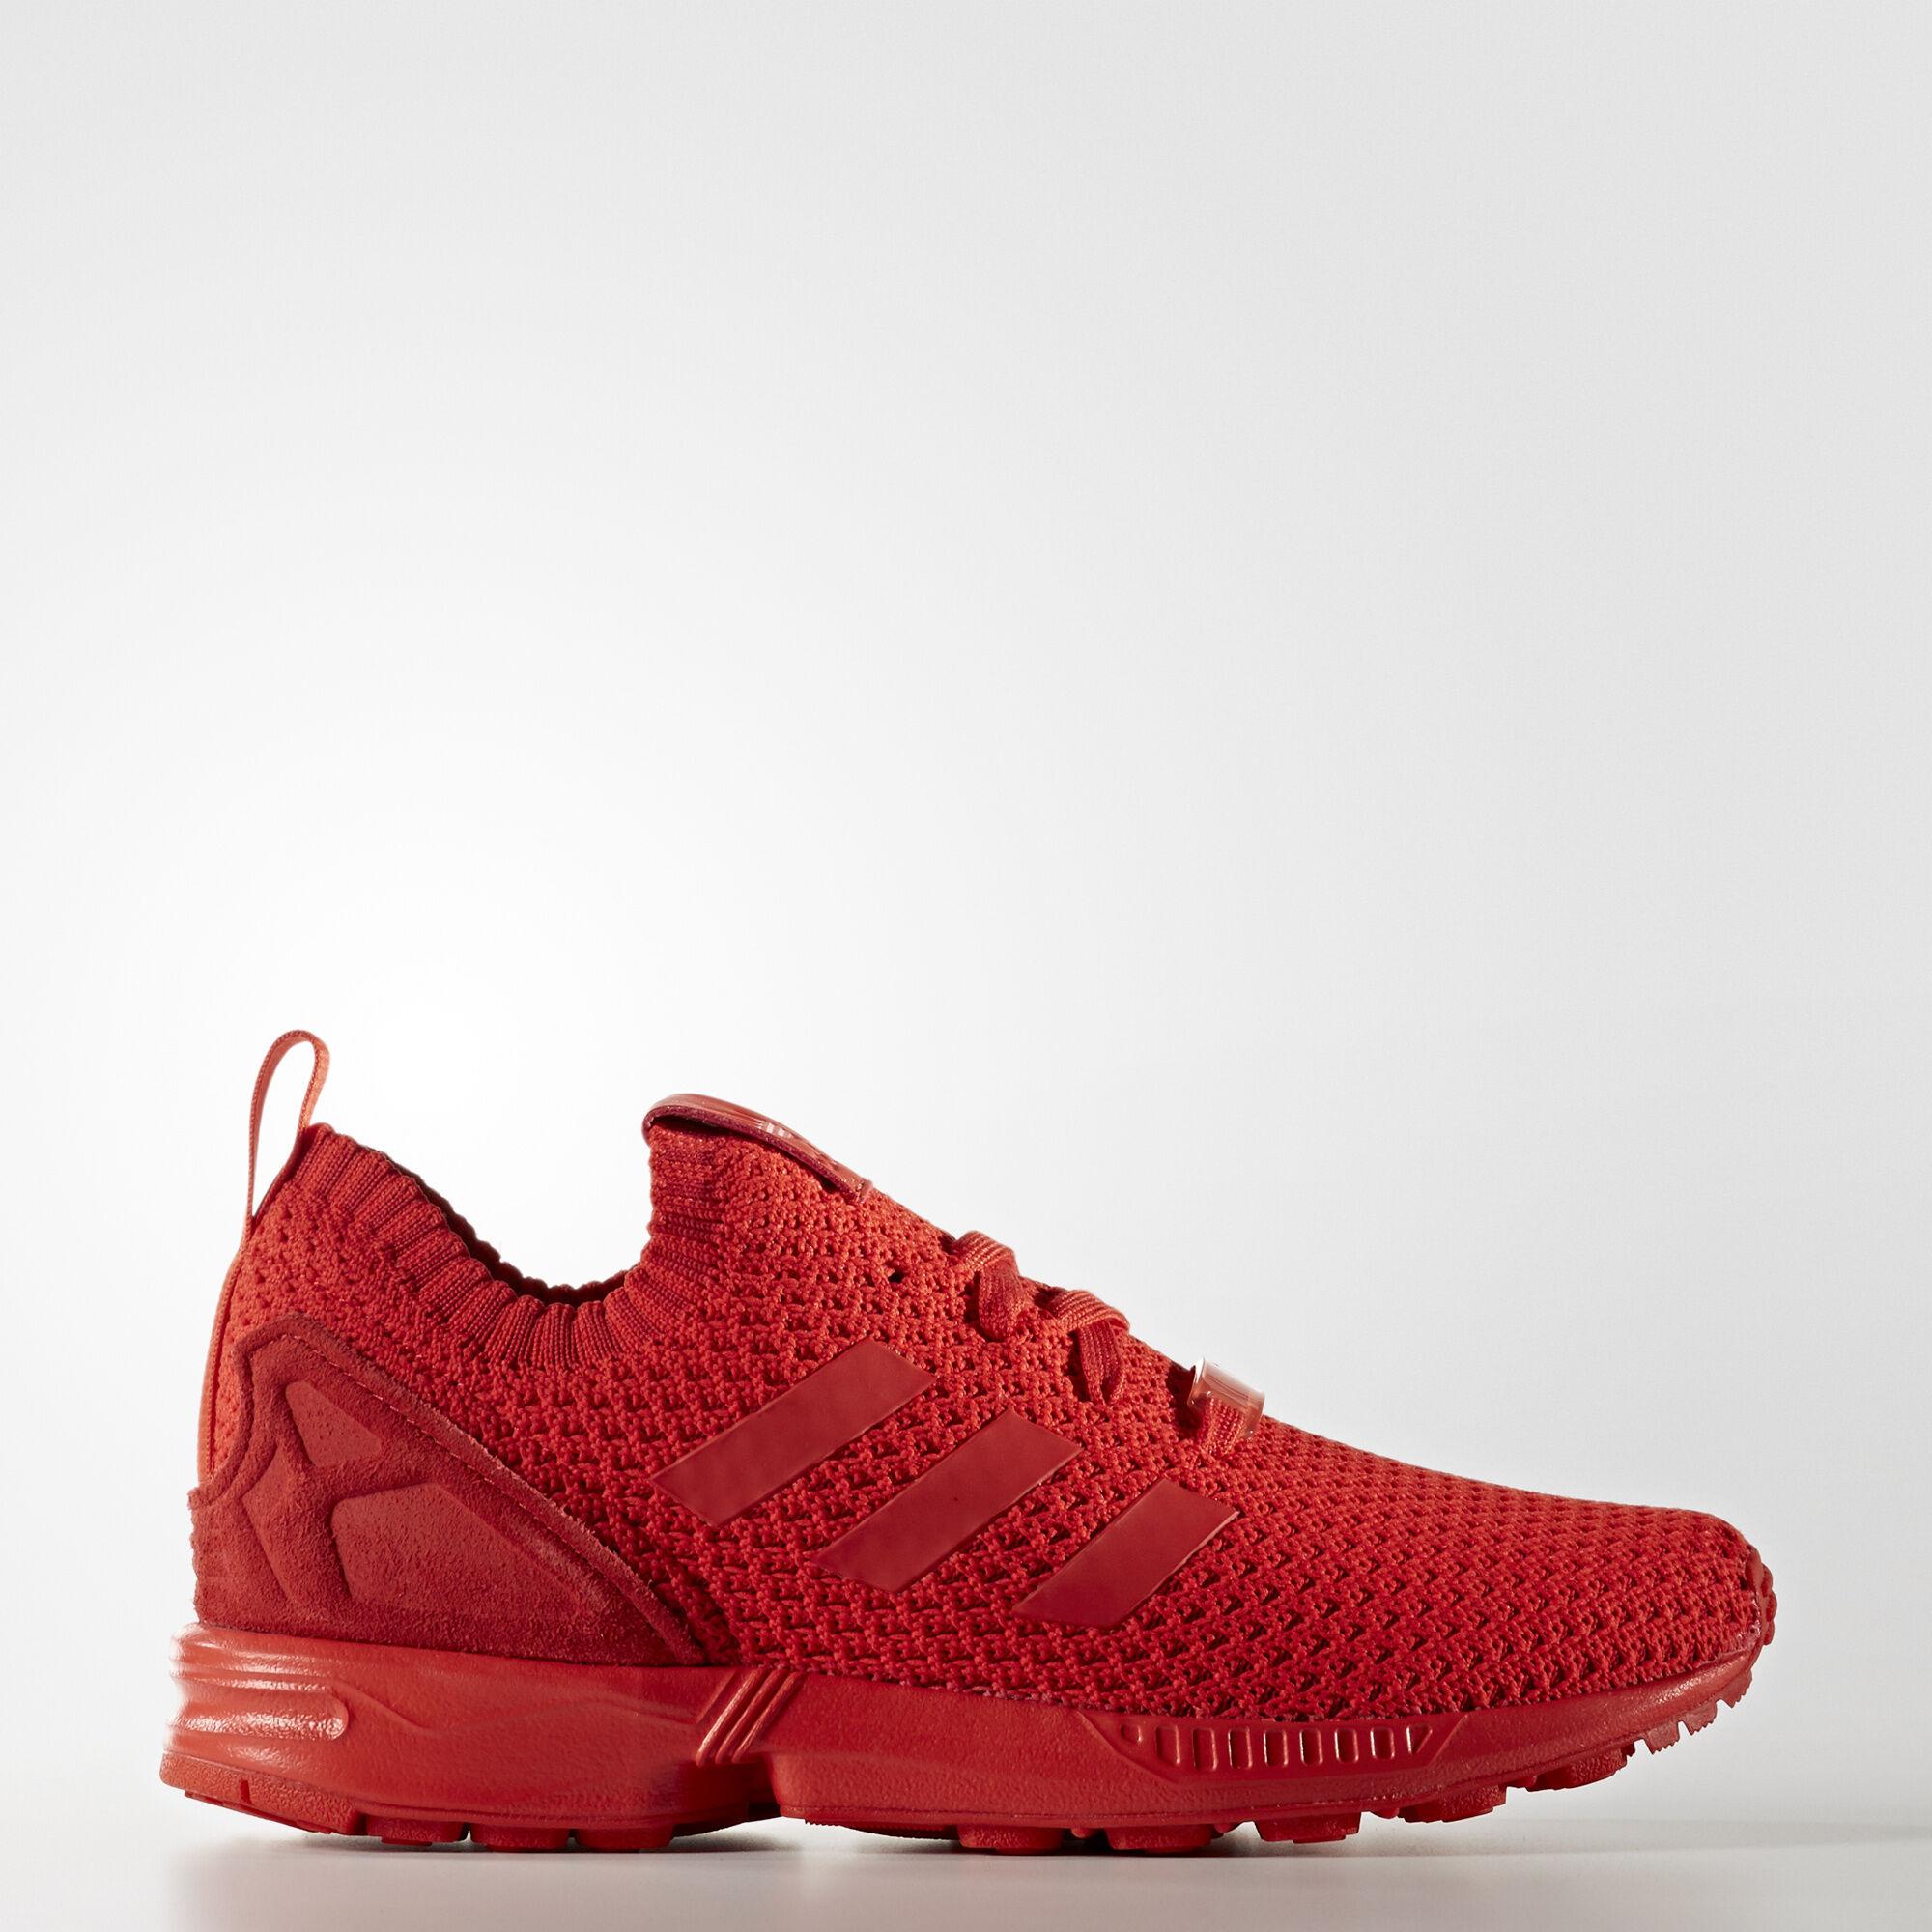 79ba00862 cheapest adidas zx 850 black blue 2ce27 28b86  coupon adidas zx 850 kids  red 440b2 304d7